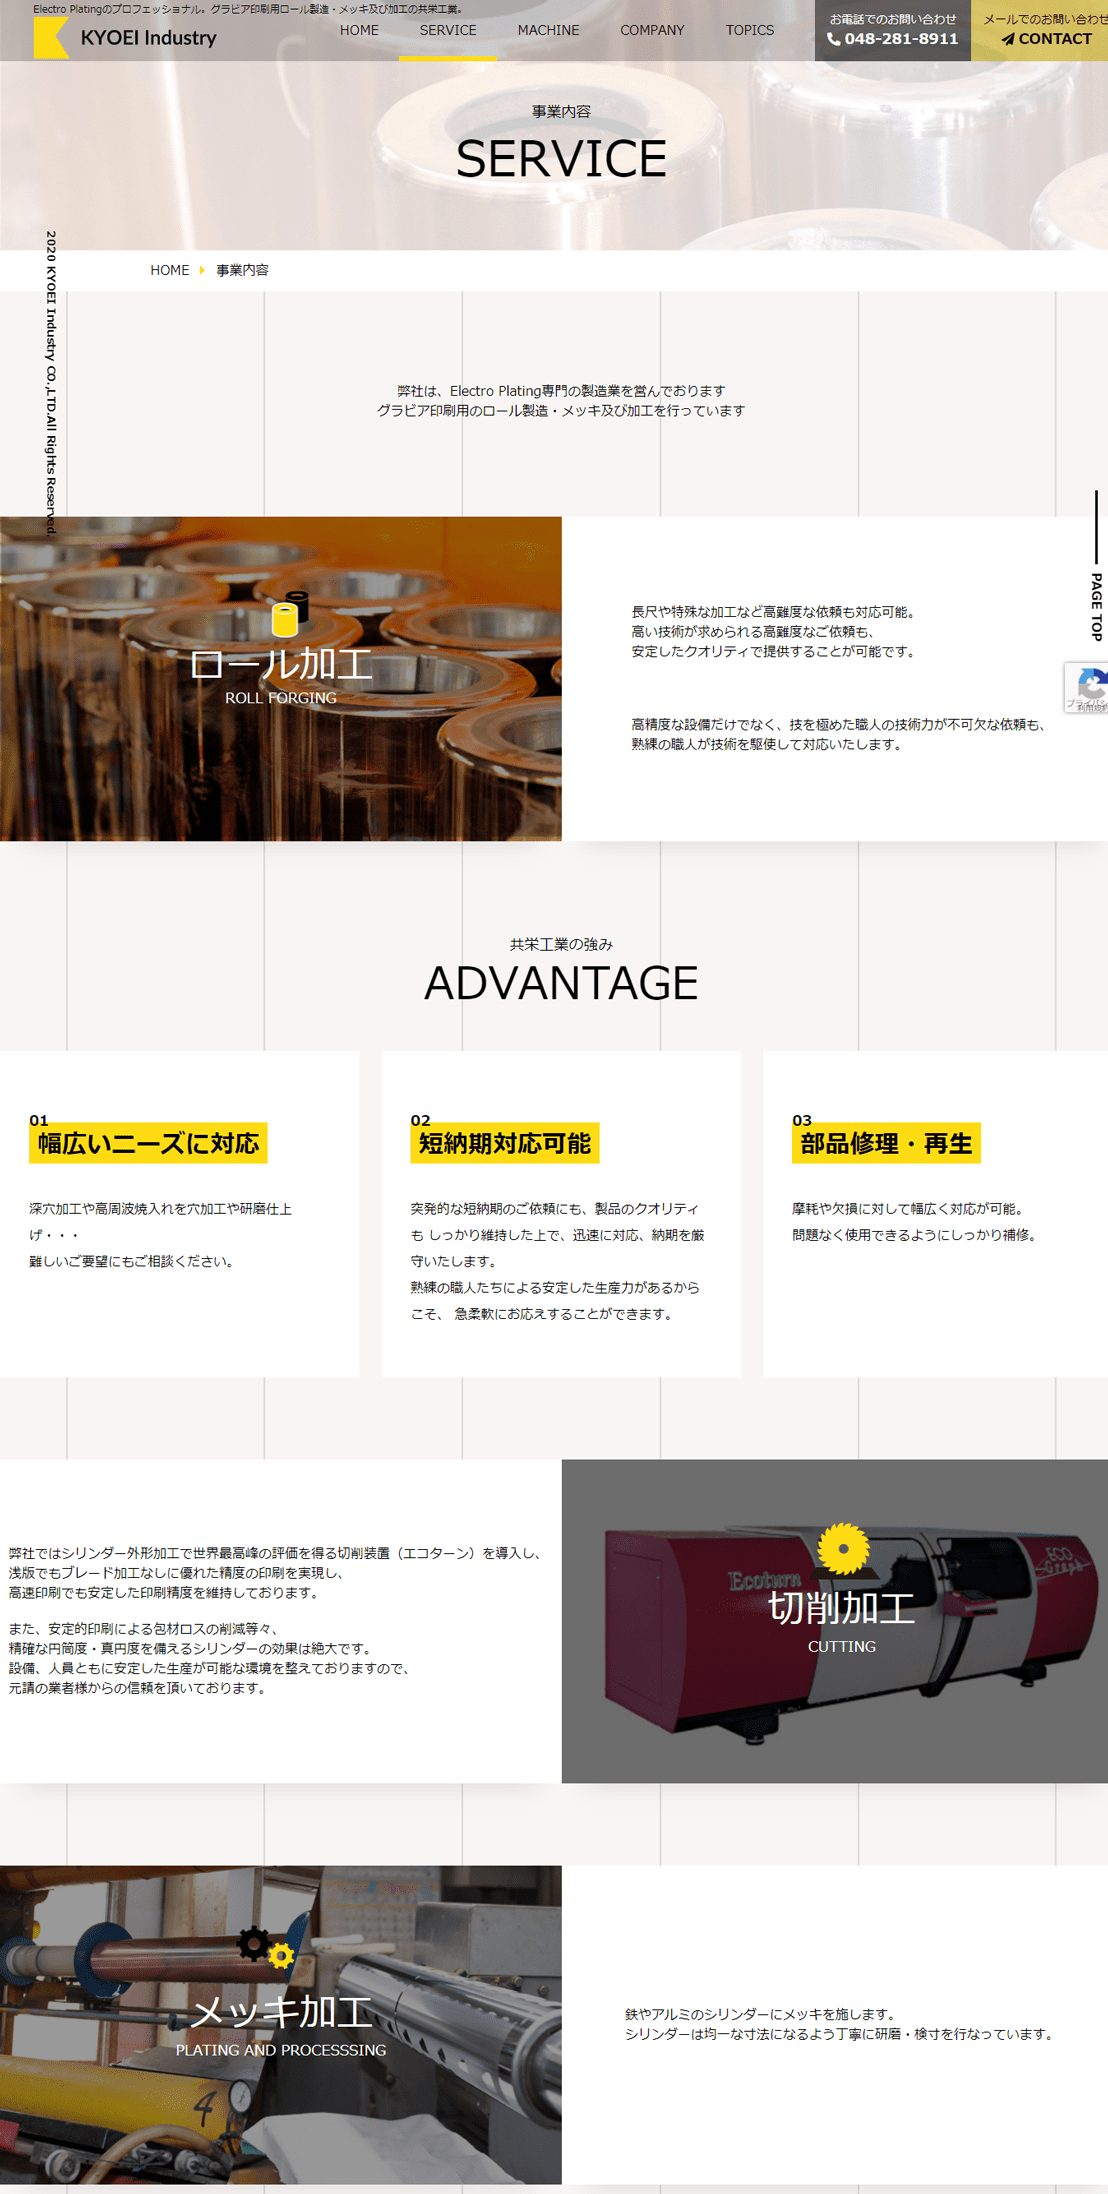 kyouei-kougyou.net_service_-(1)-min